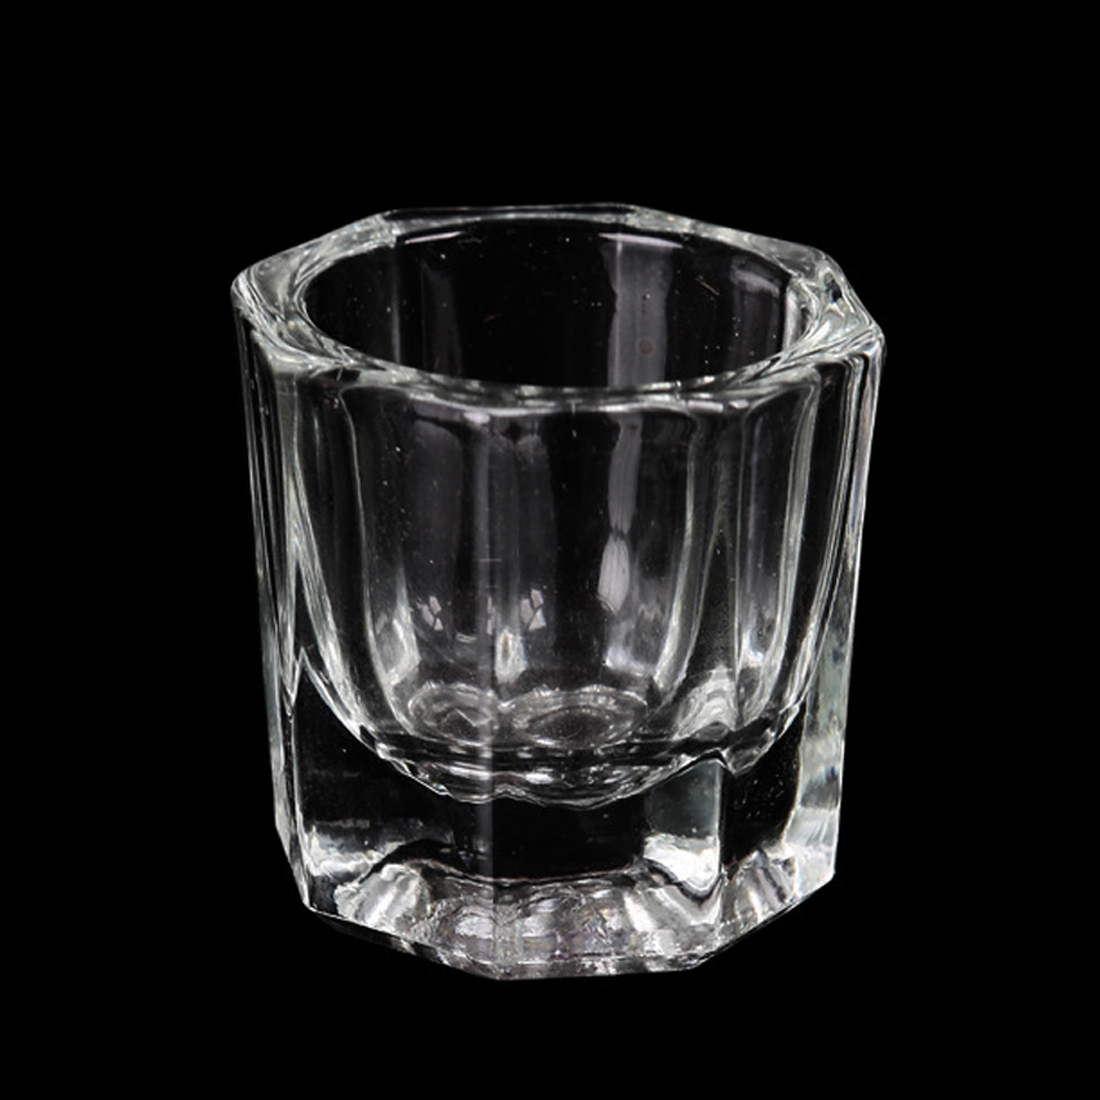 Top Quality <font><b>Nail</b></font> Tools <font><b>Crystal</b></font> <font><b>Nail</b></font> Glass <font><b>Octagonal</b></font> <font><b>Crystal</b></font> <font><b>Cup</b></font> Glasses Liquid <font><b>Cup</b></font> <font><b>Nail</b></font> <font><b>Art</b></font> Tools